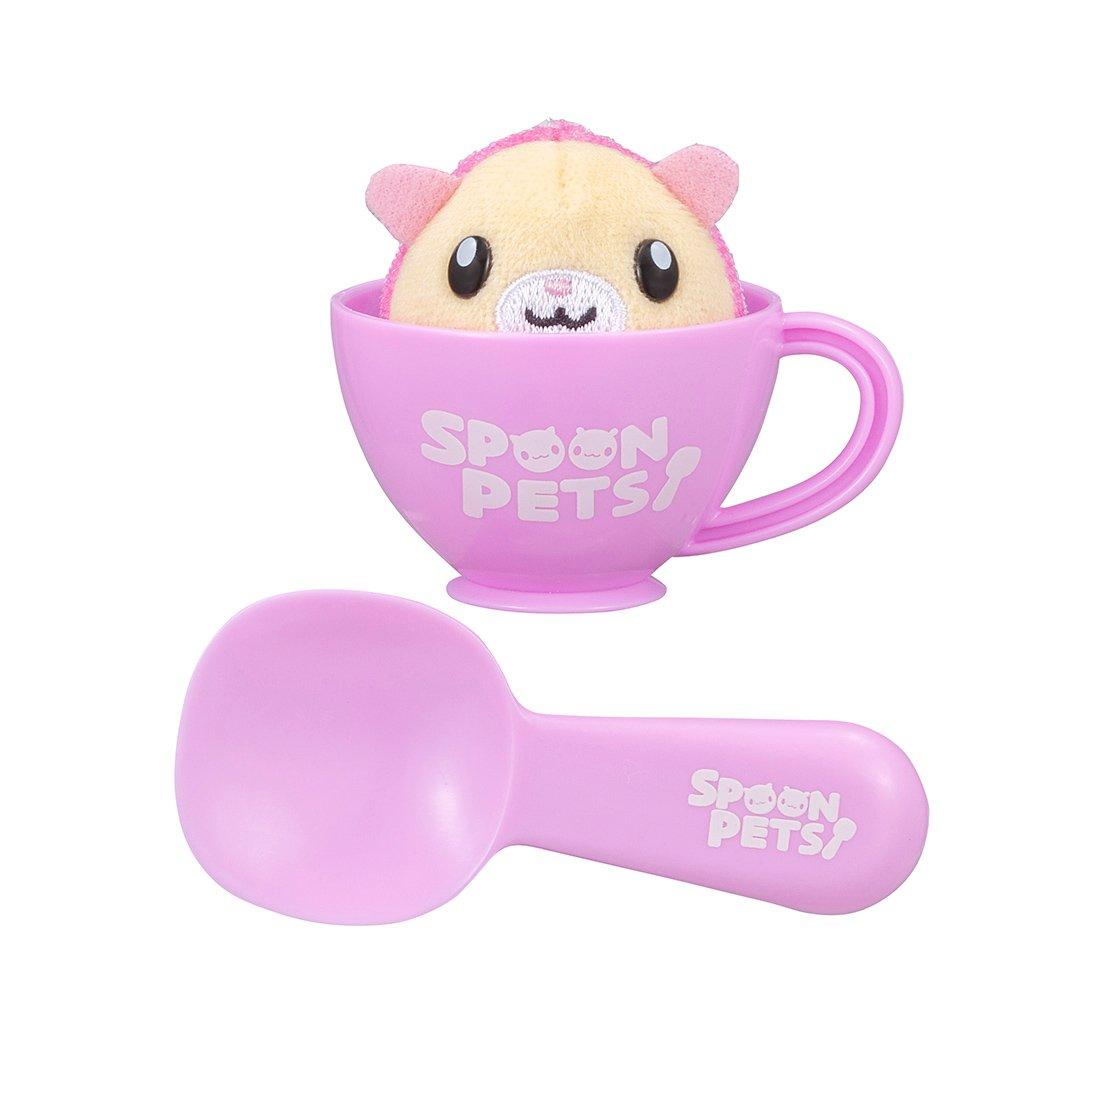 SPOON PETS pet spoons fairy tale Mermaid Princess theme